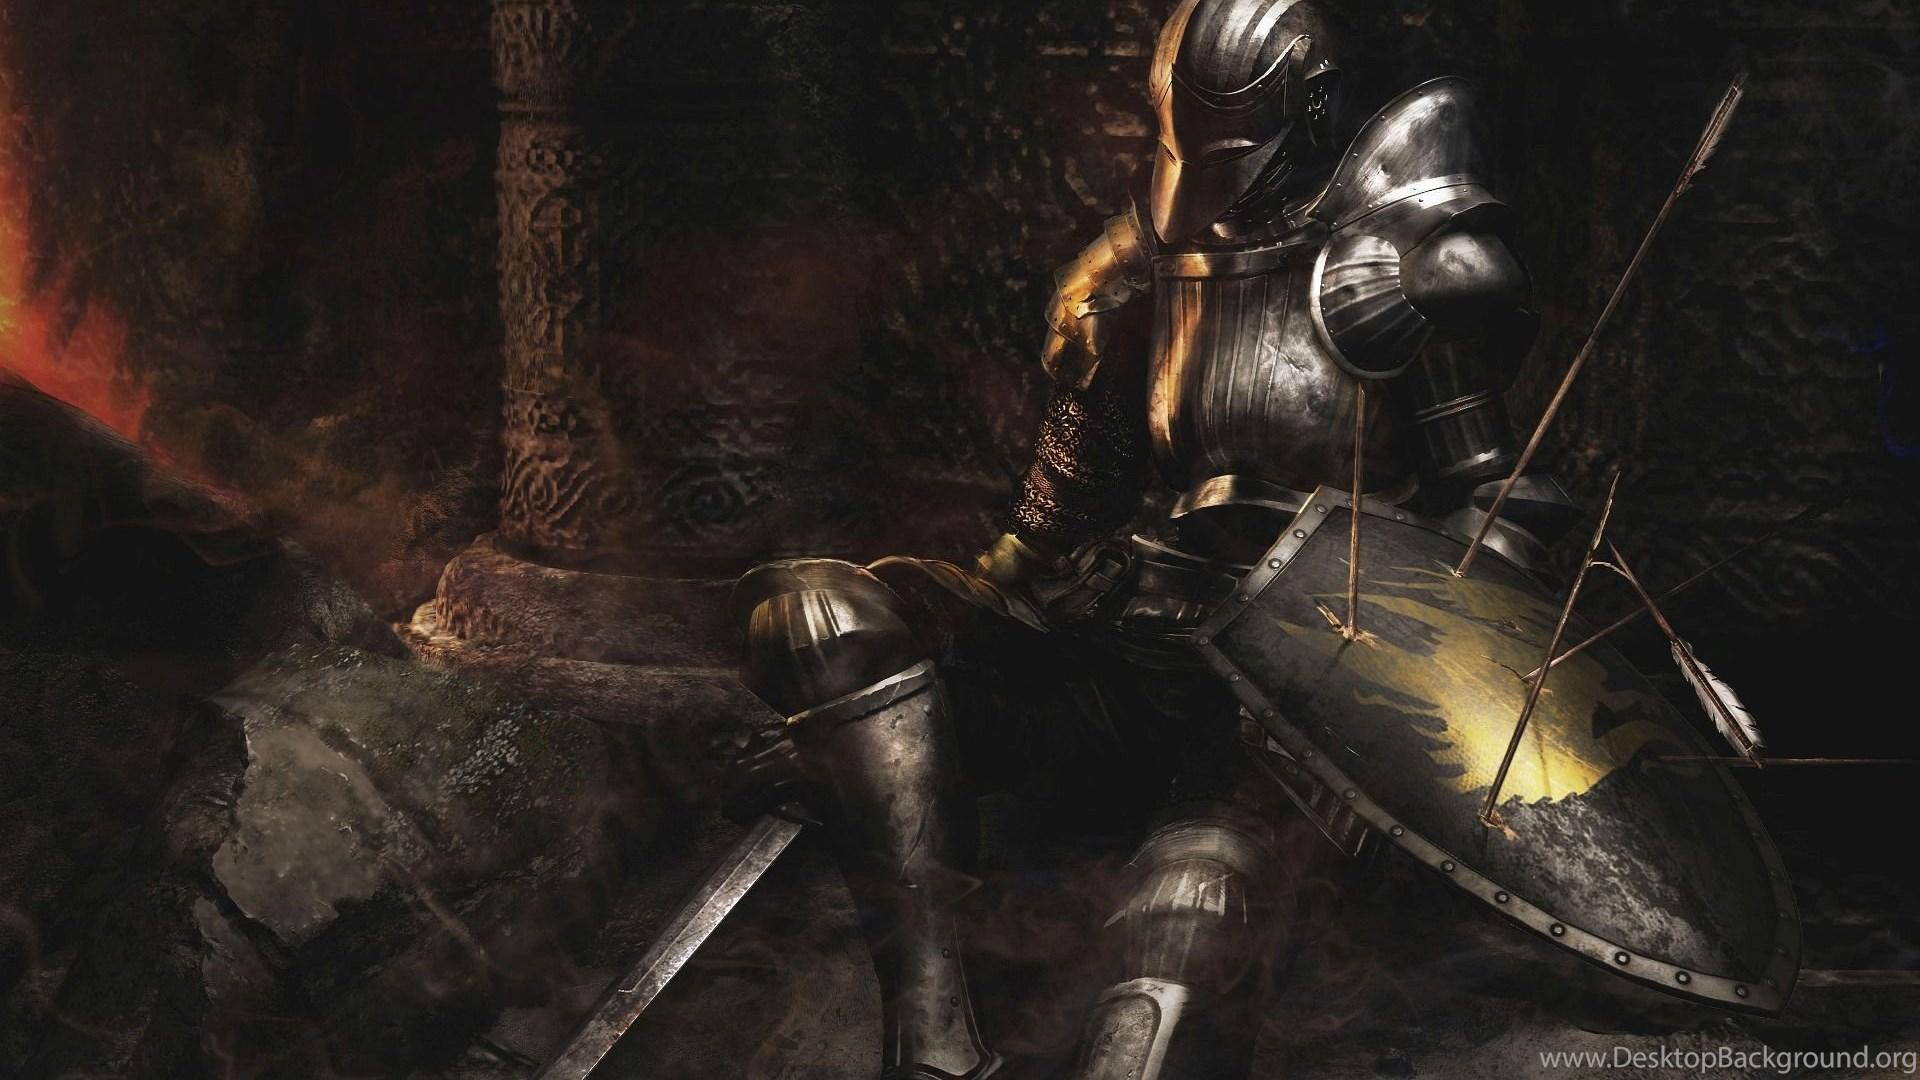 Dark Souls 2 Wallpapers A3 Wallpapers Desktop Background